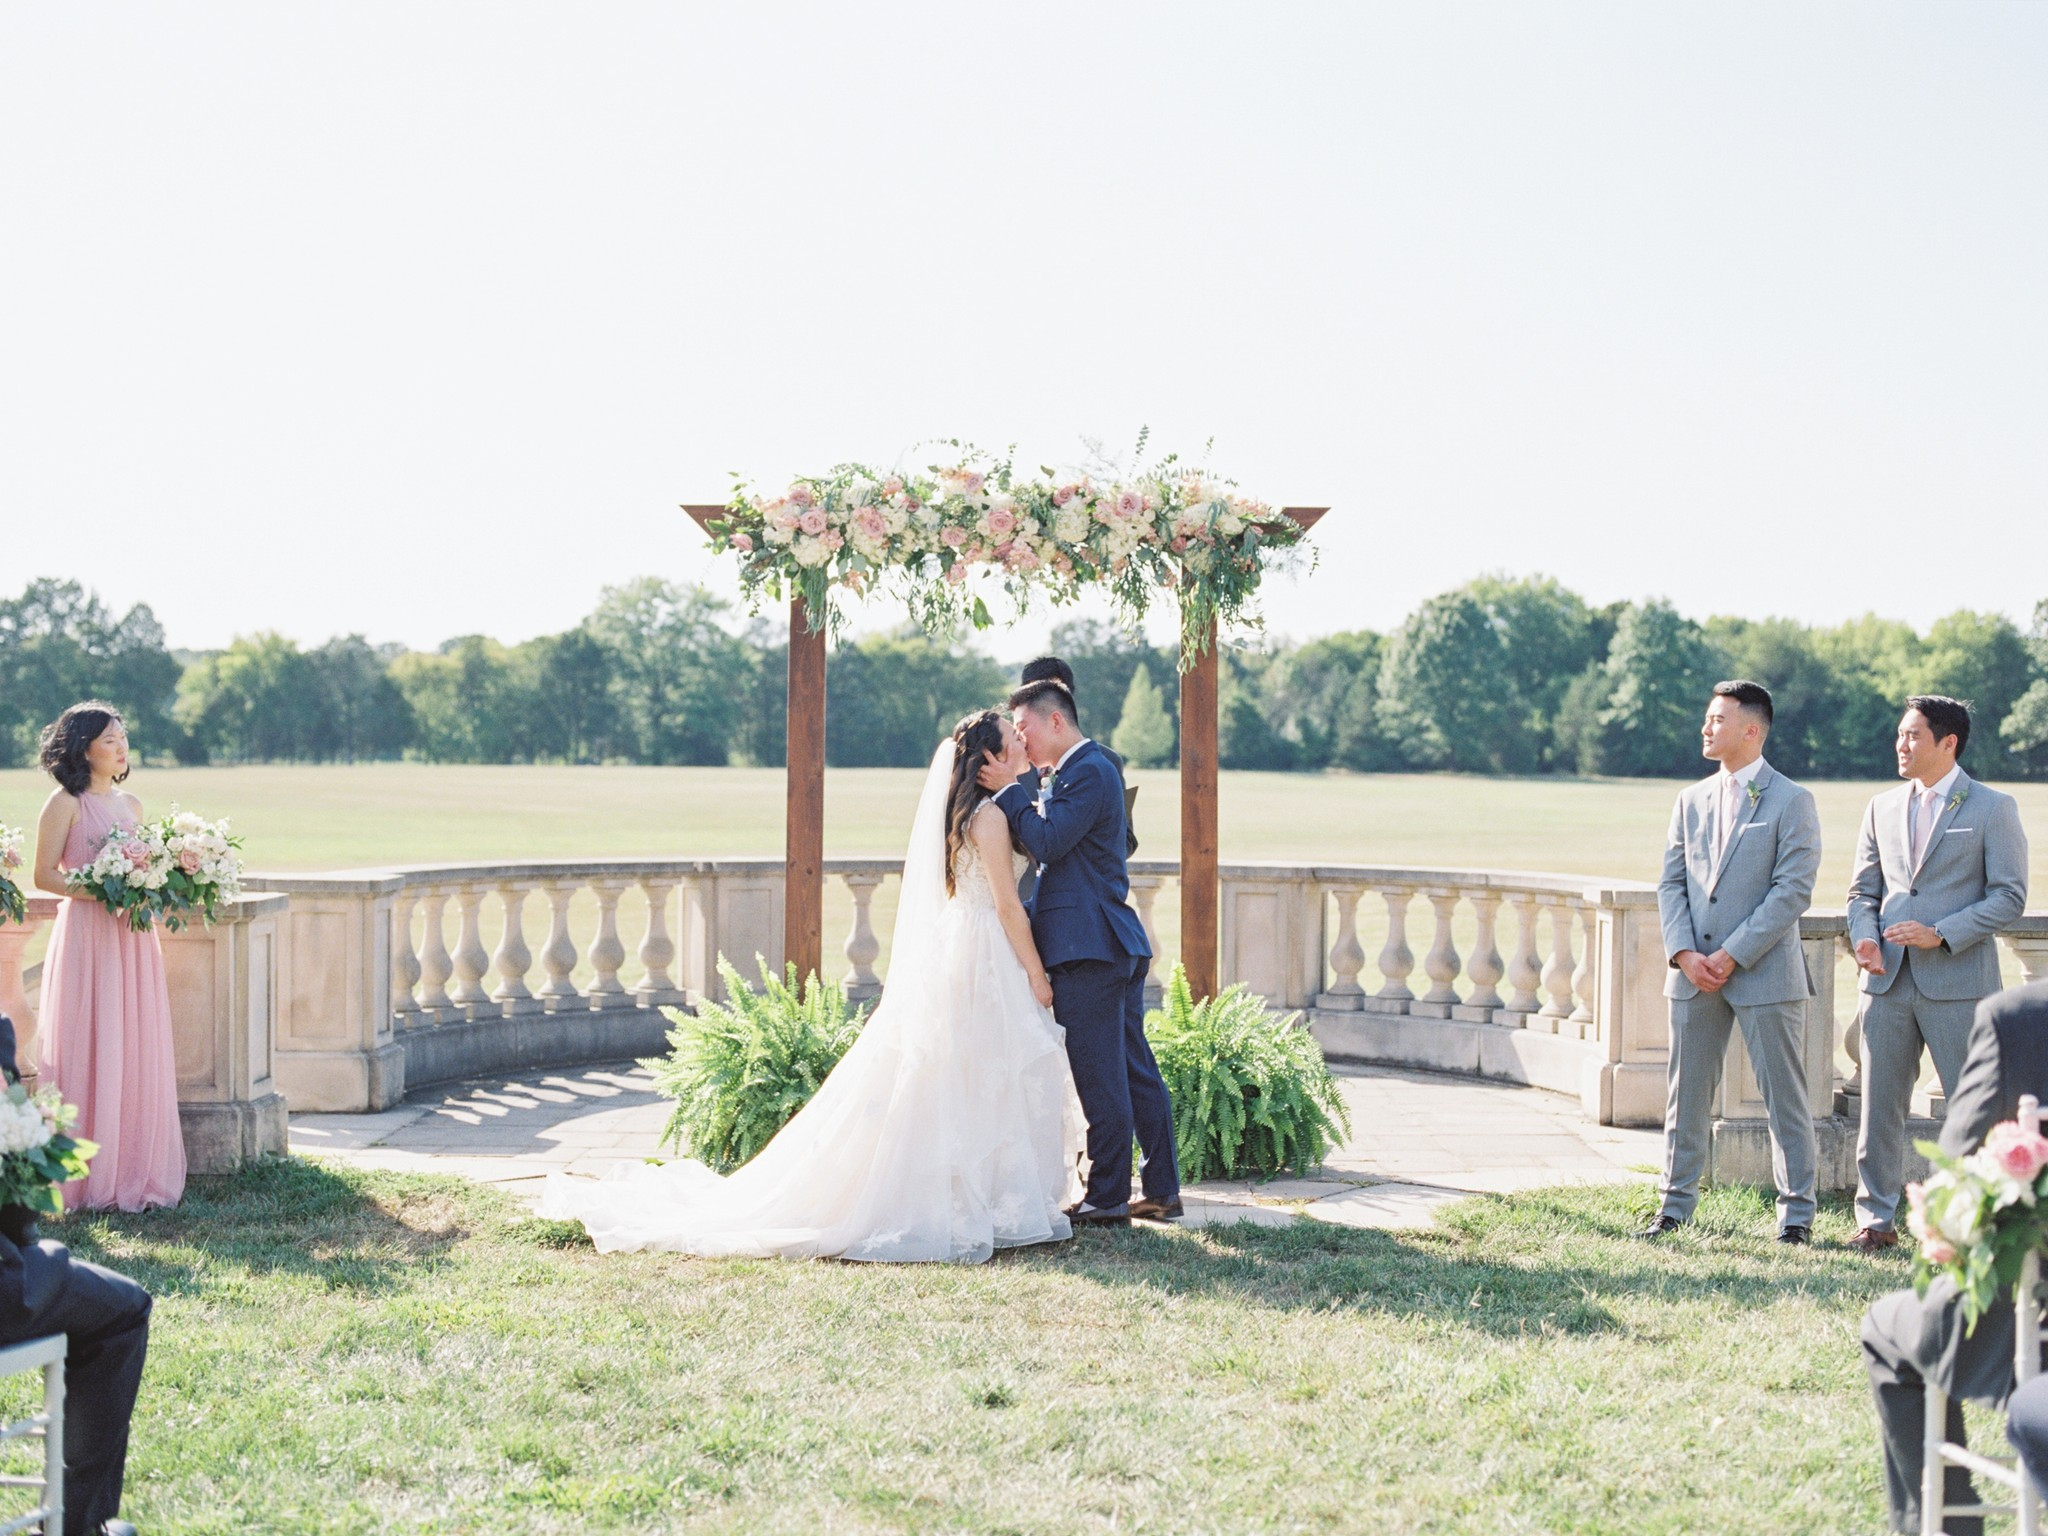 VA-Great-Marsh-Estate-Summer-Wedding-Blush-64.jpg